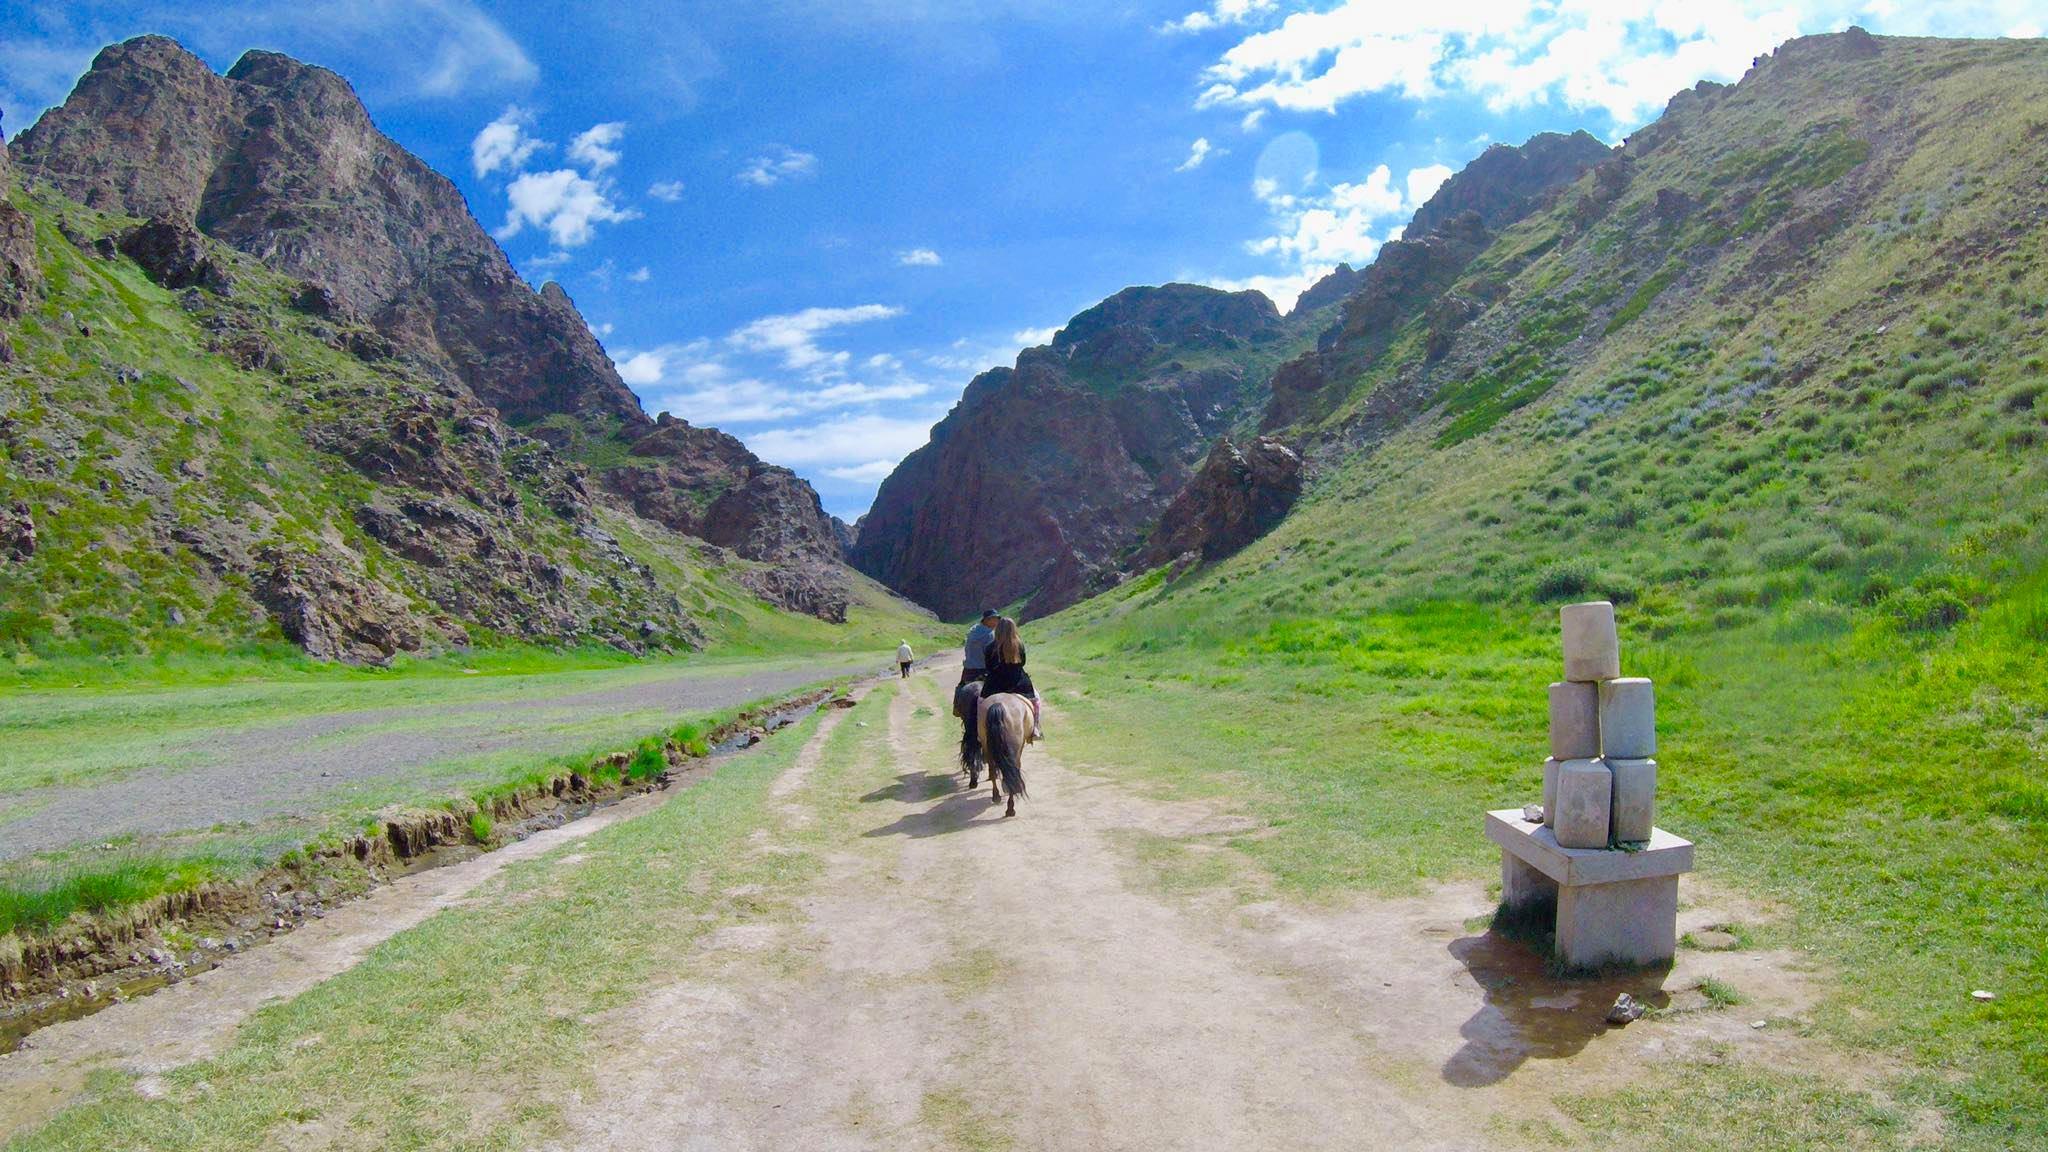 Kach Solo Travels in 2019 Horseback riding trip to the Gobi Gurvan Saikhan National Park15.jpg